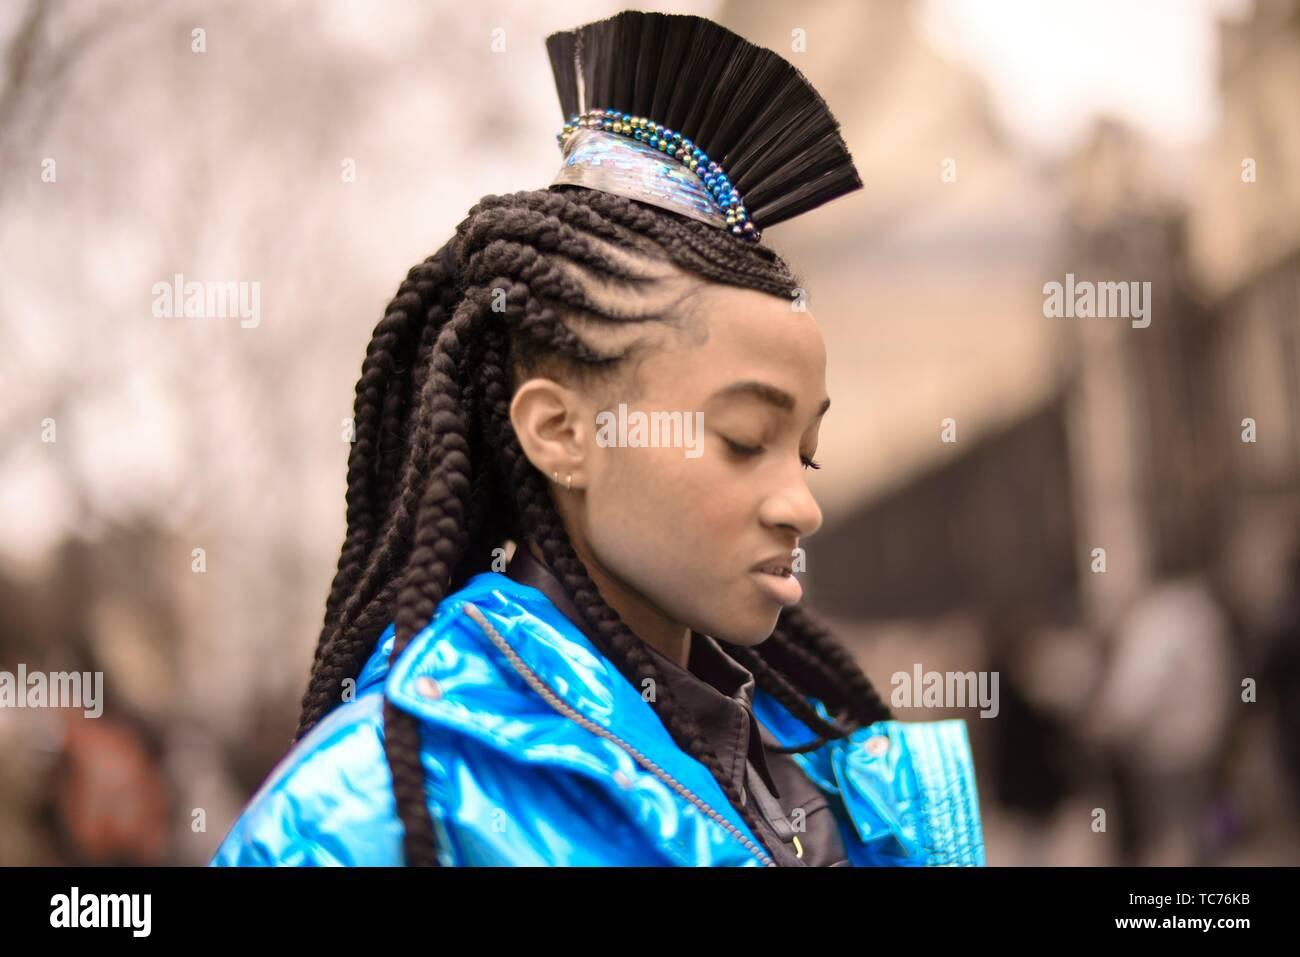 Street Style - Paris Fashion Week Womenswear Fall/Winter 2019/2020, guest with hair decoration, dreadlock hair style, seen outside Altuzarra, Day - Stock Image